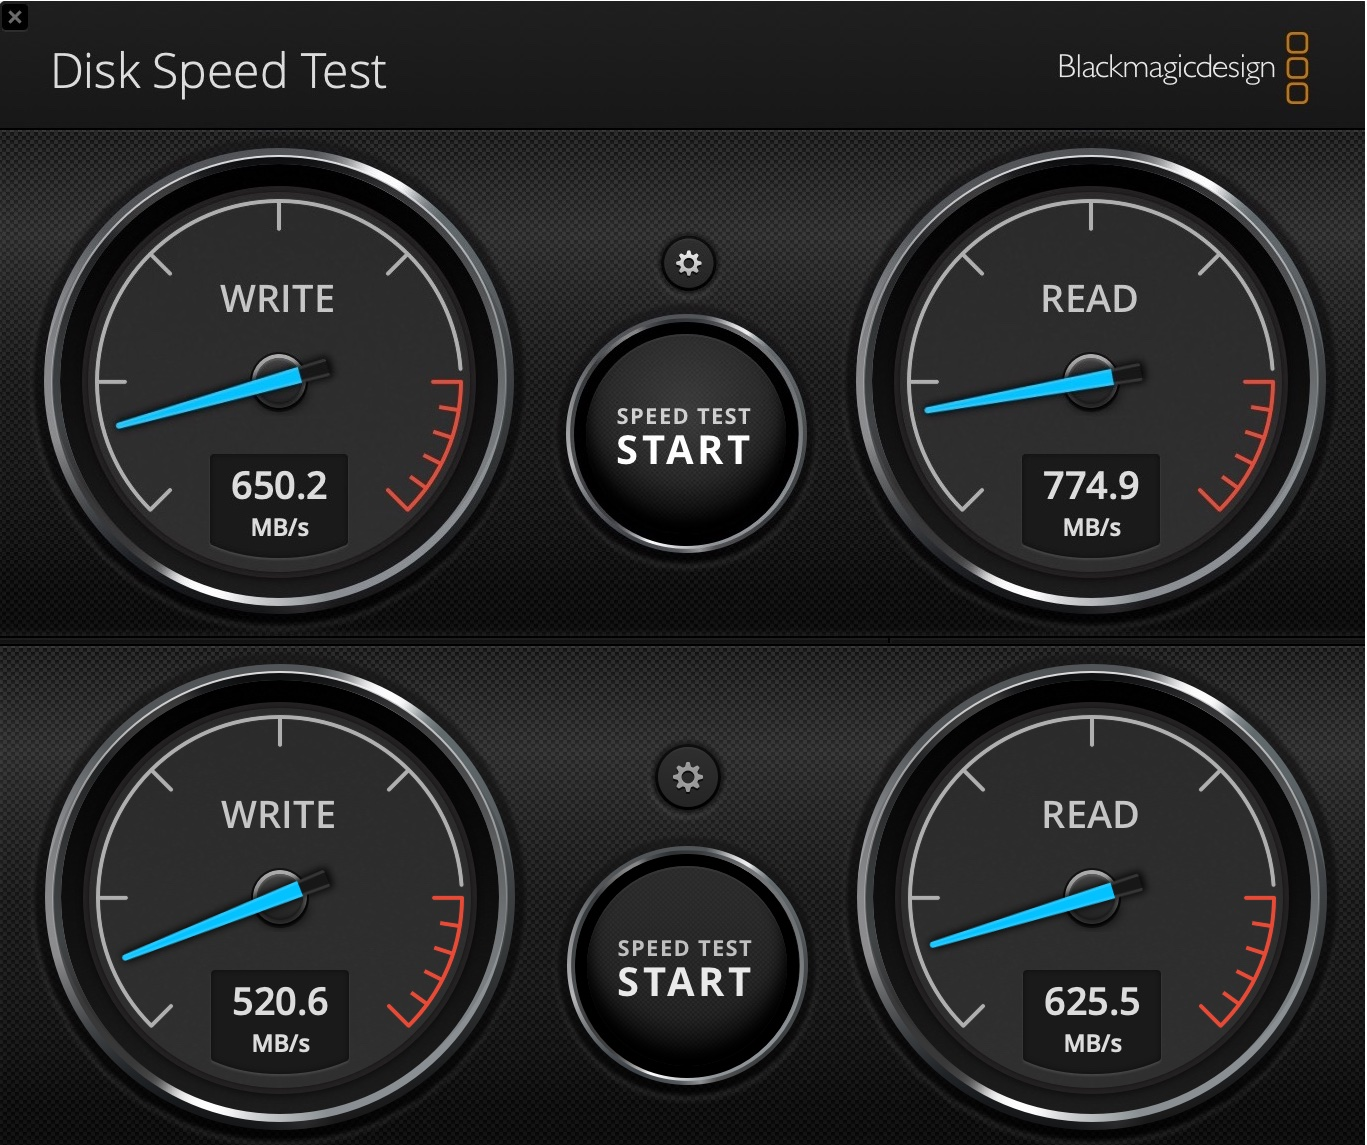 DiskSpeedTest Transcend External 1 - Recenzia Transcend JetDrive 855: jednoduchý upgrade SSD v Macu